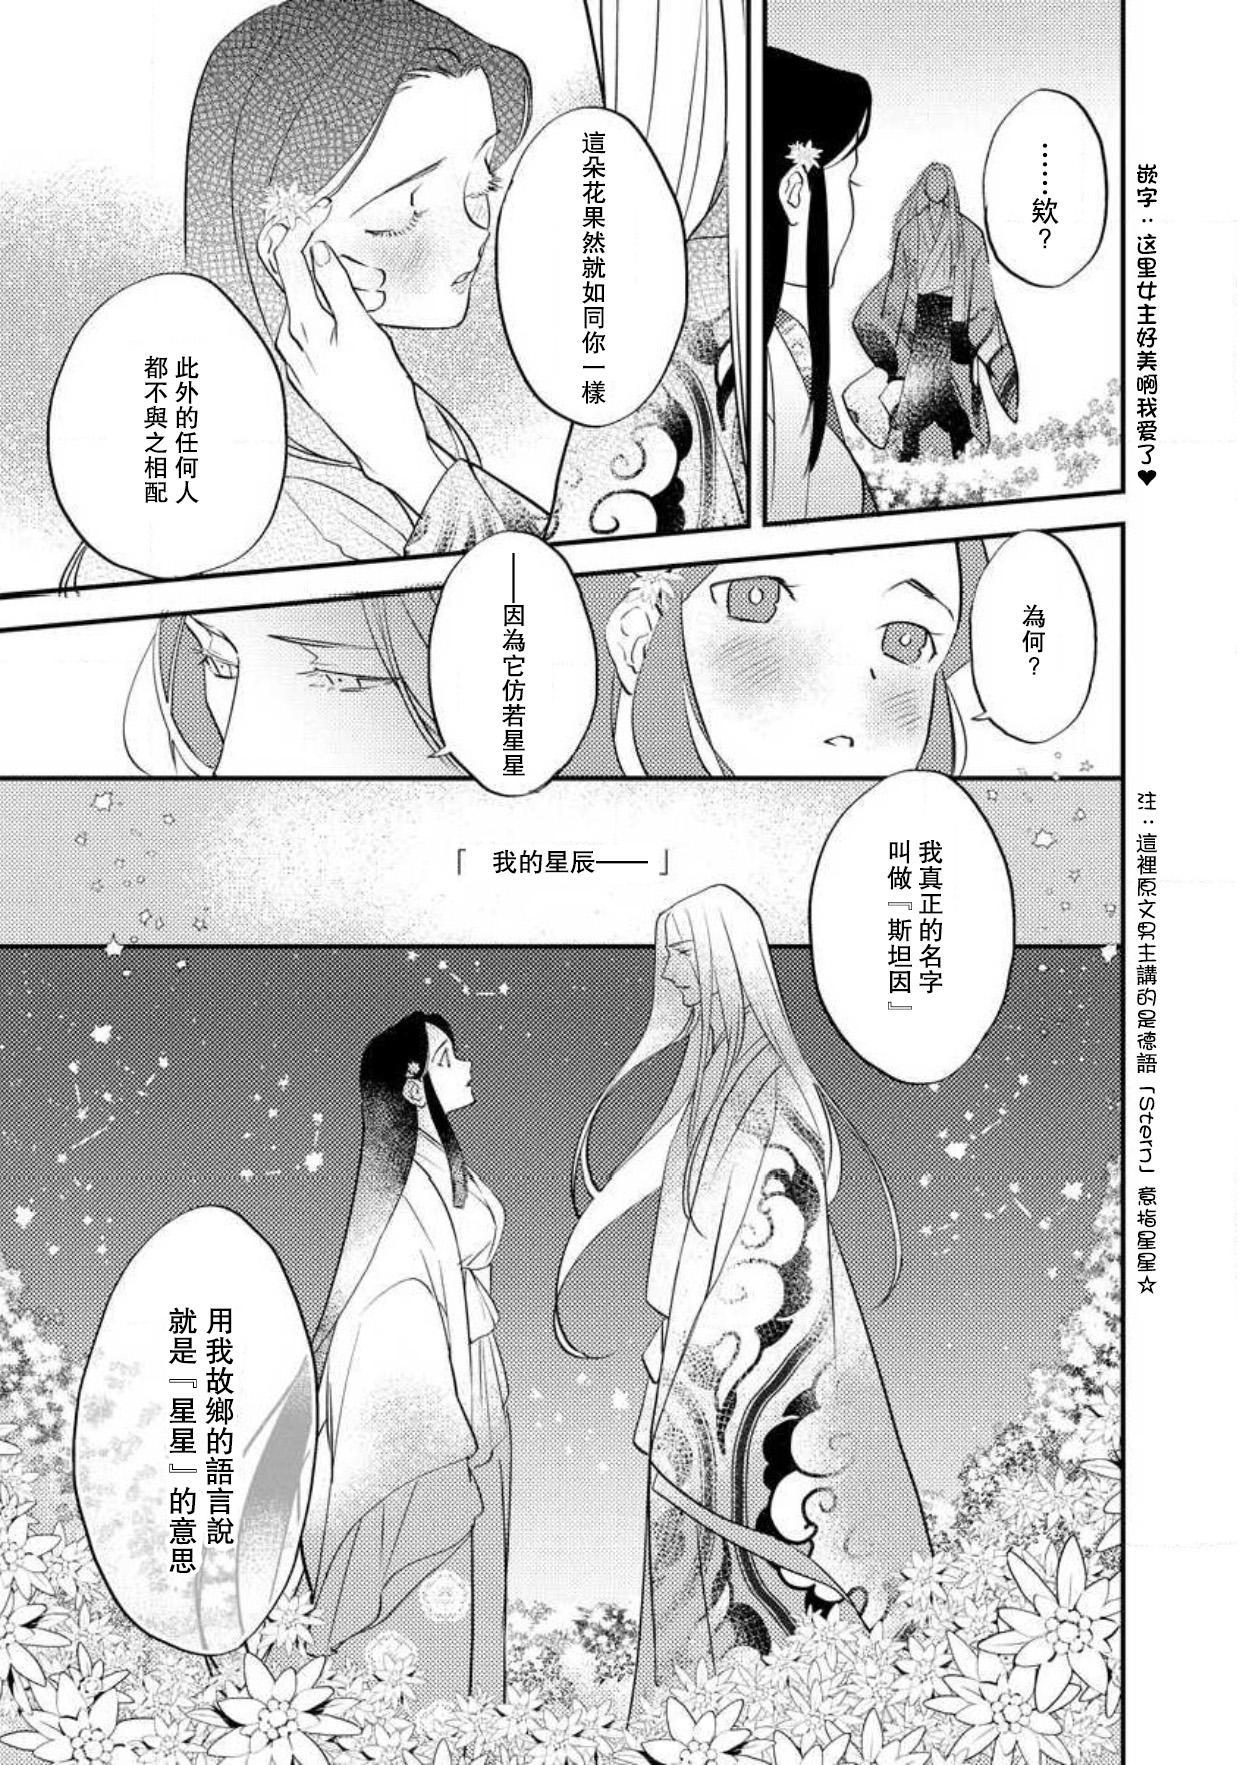 Oeyama suimutan utsukushiki oni no toraware hime | 大江山醉夢逸話 美麗的鬼與被囚禁的公主 Ch. 1-8 190